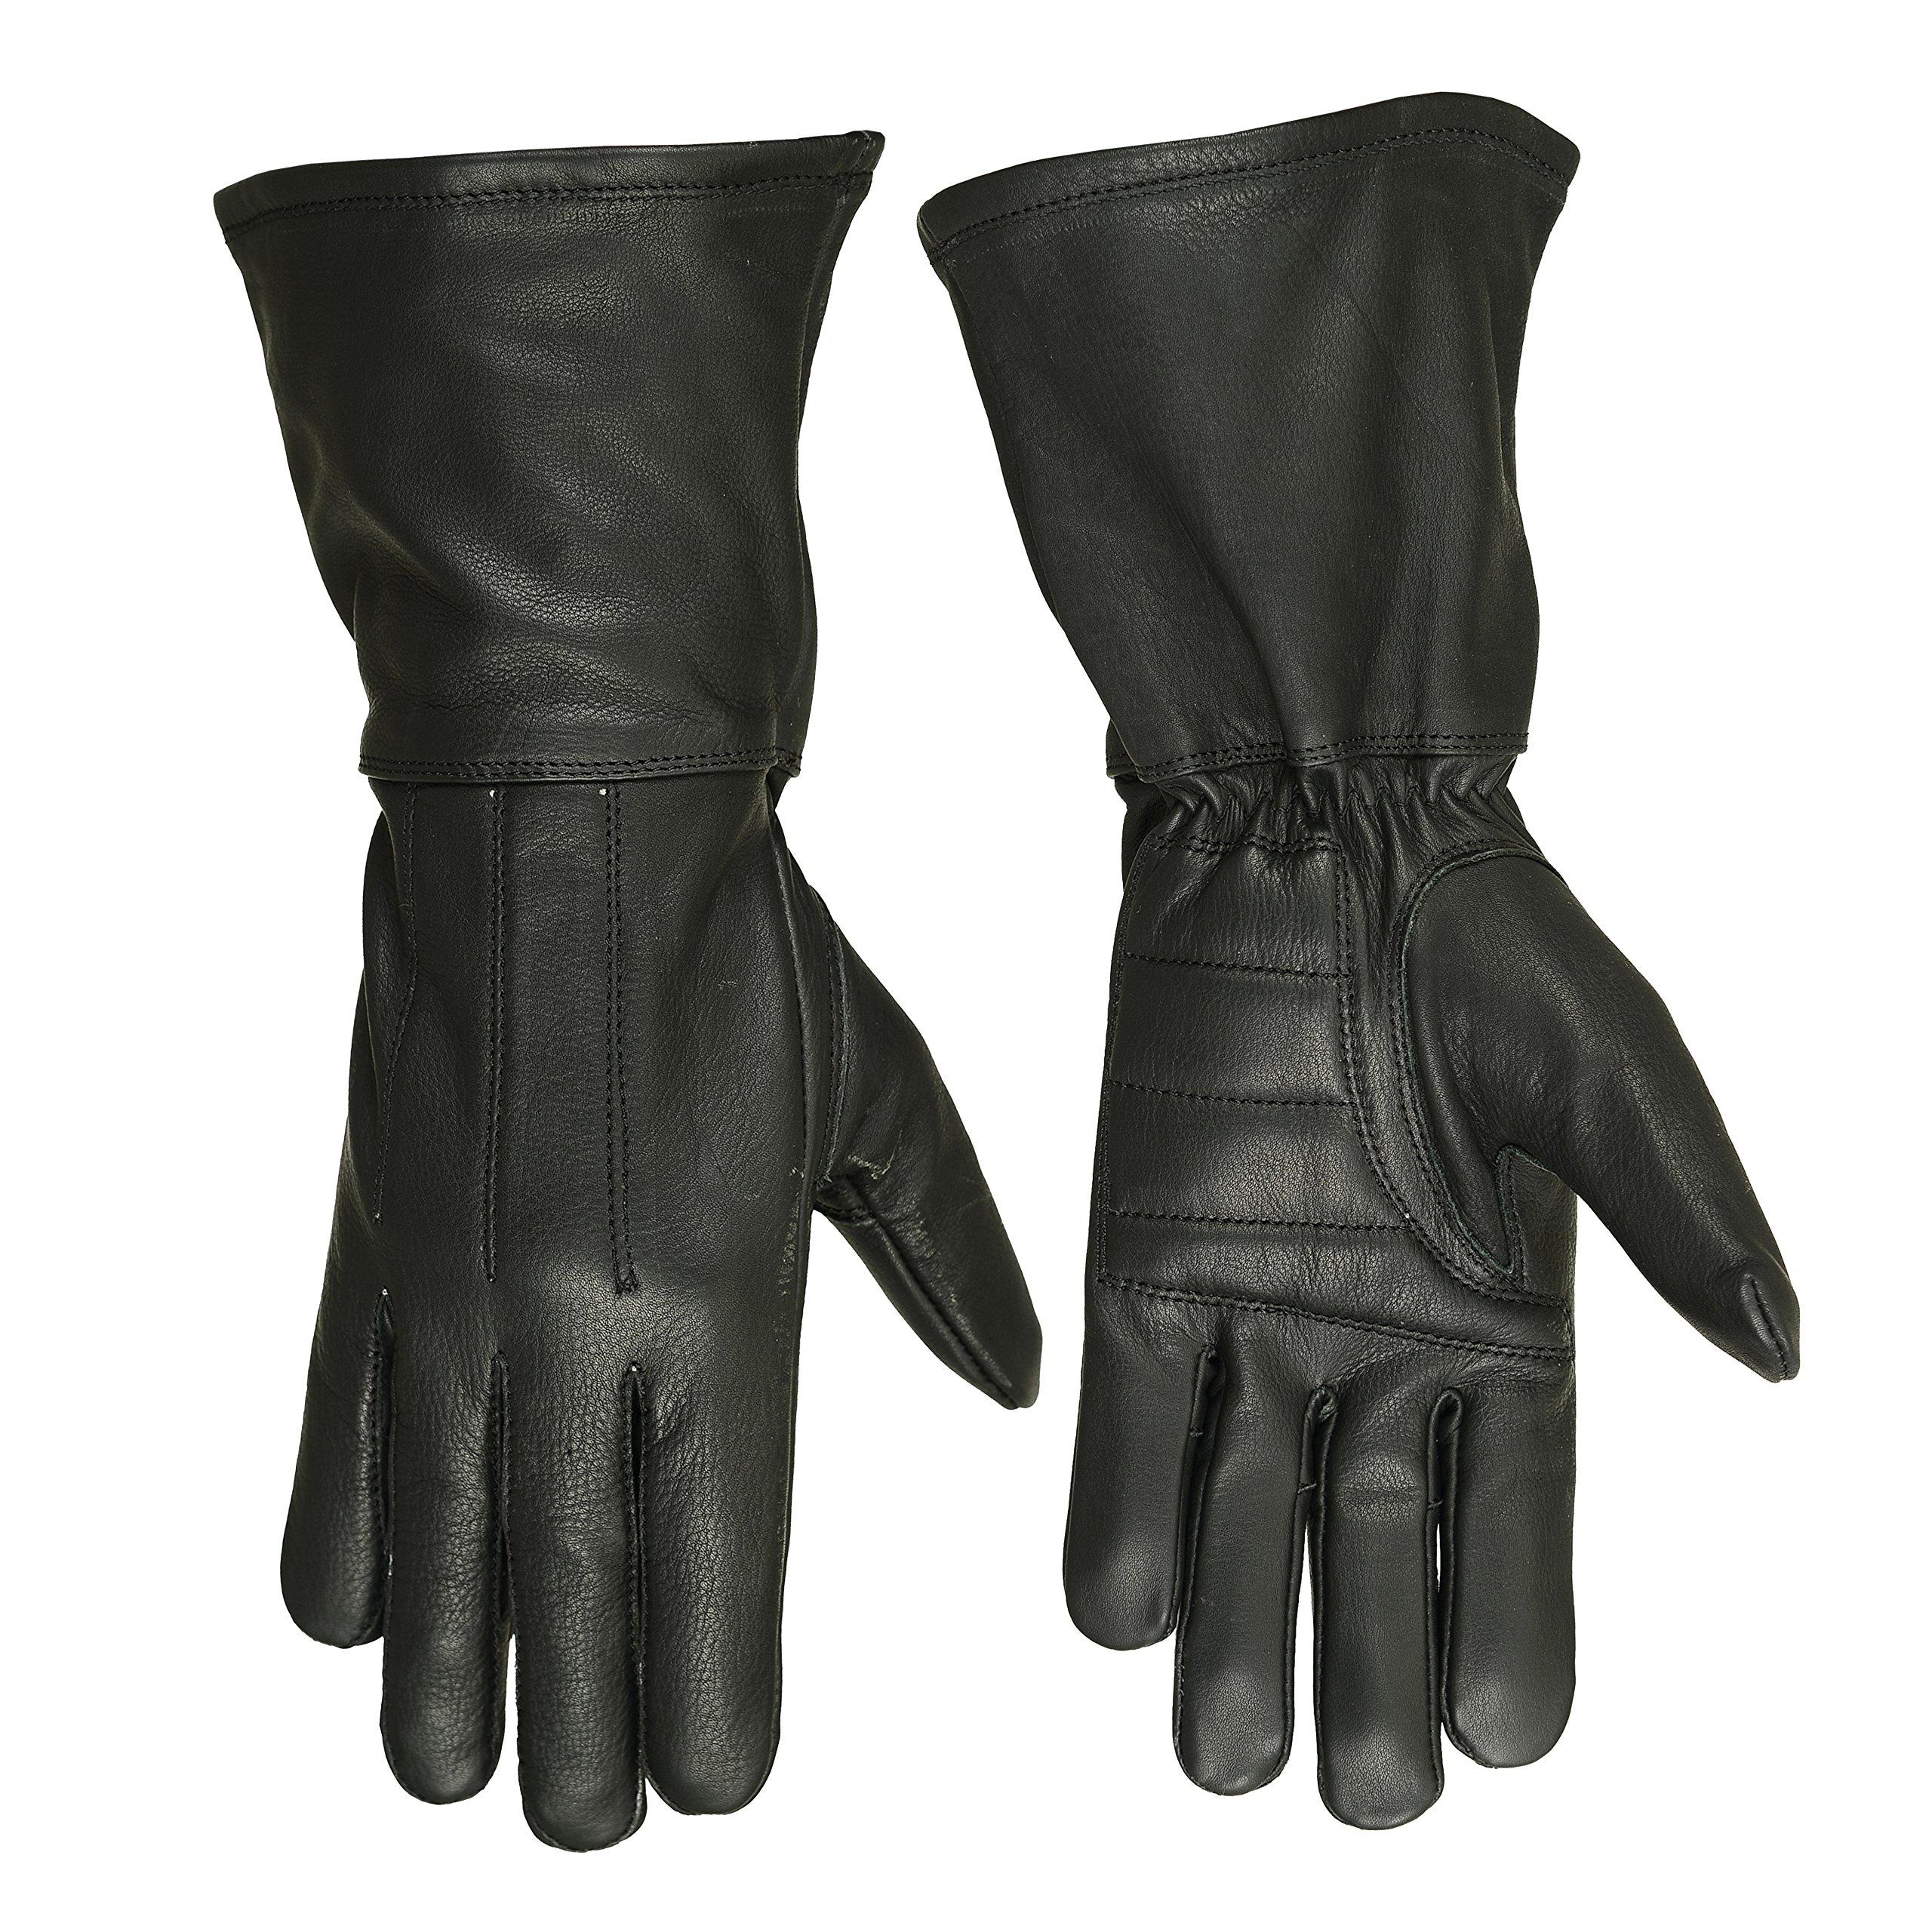 Hugger Glove Company Men's Classic Unlined Seasonal Wind Stopper Gauntlet (Large)